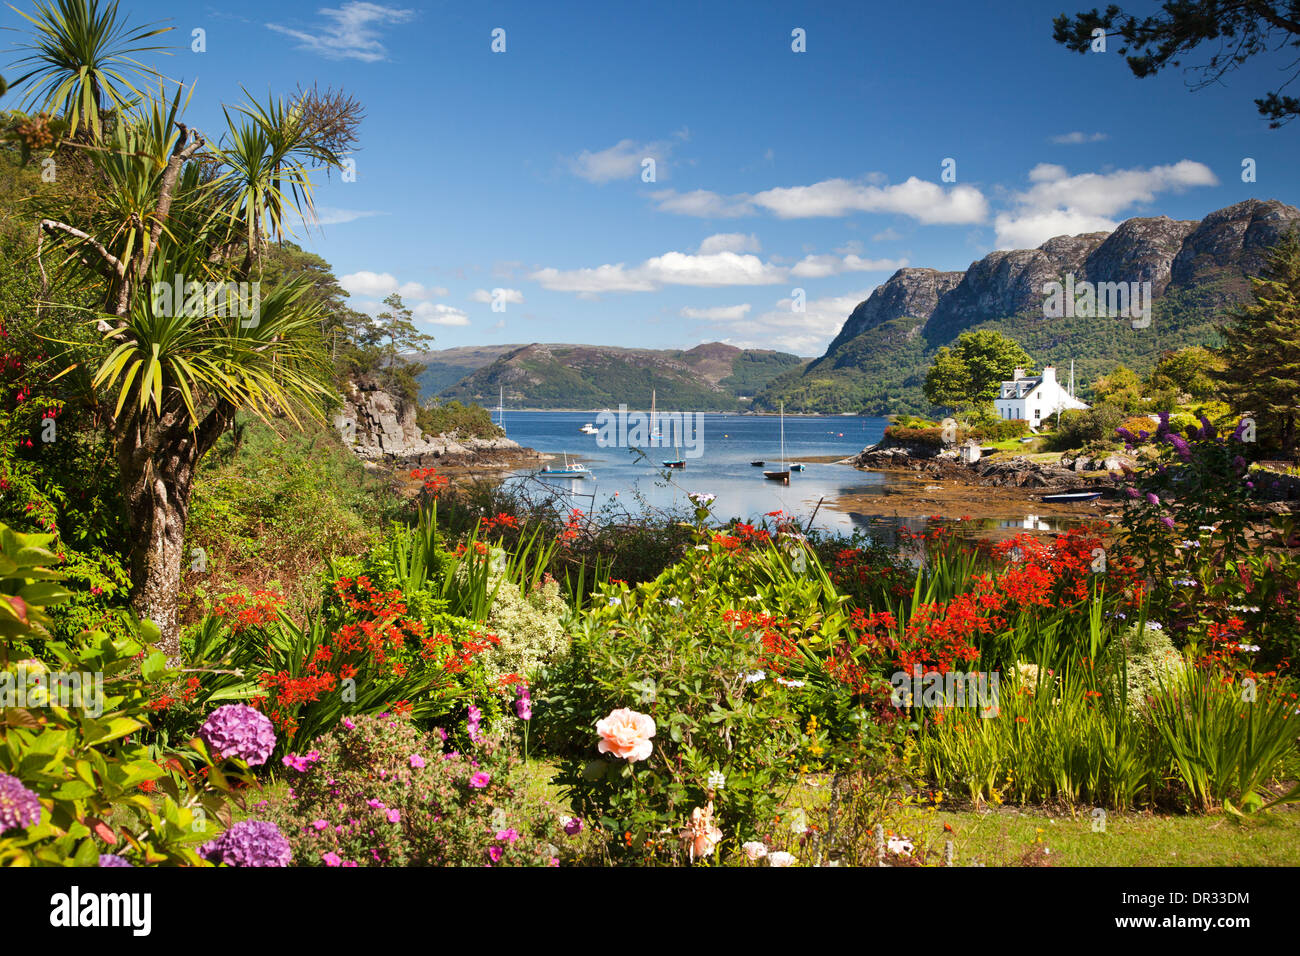 Plockton, Lochalsh, Highlands of Scotland - Stock Image